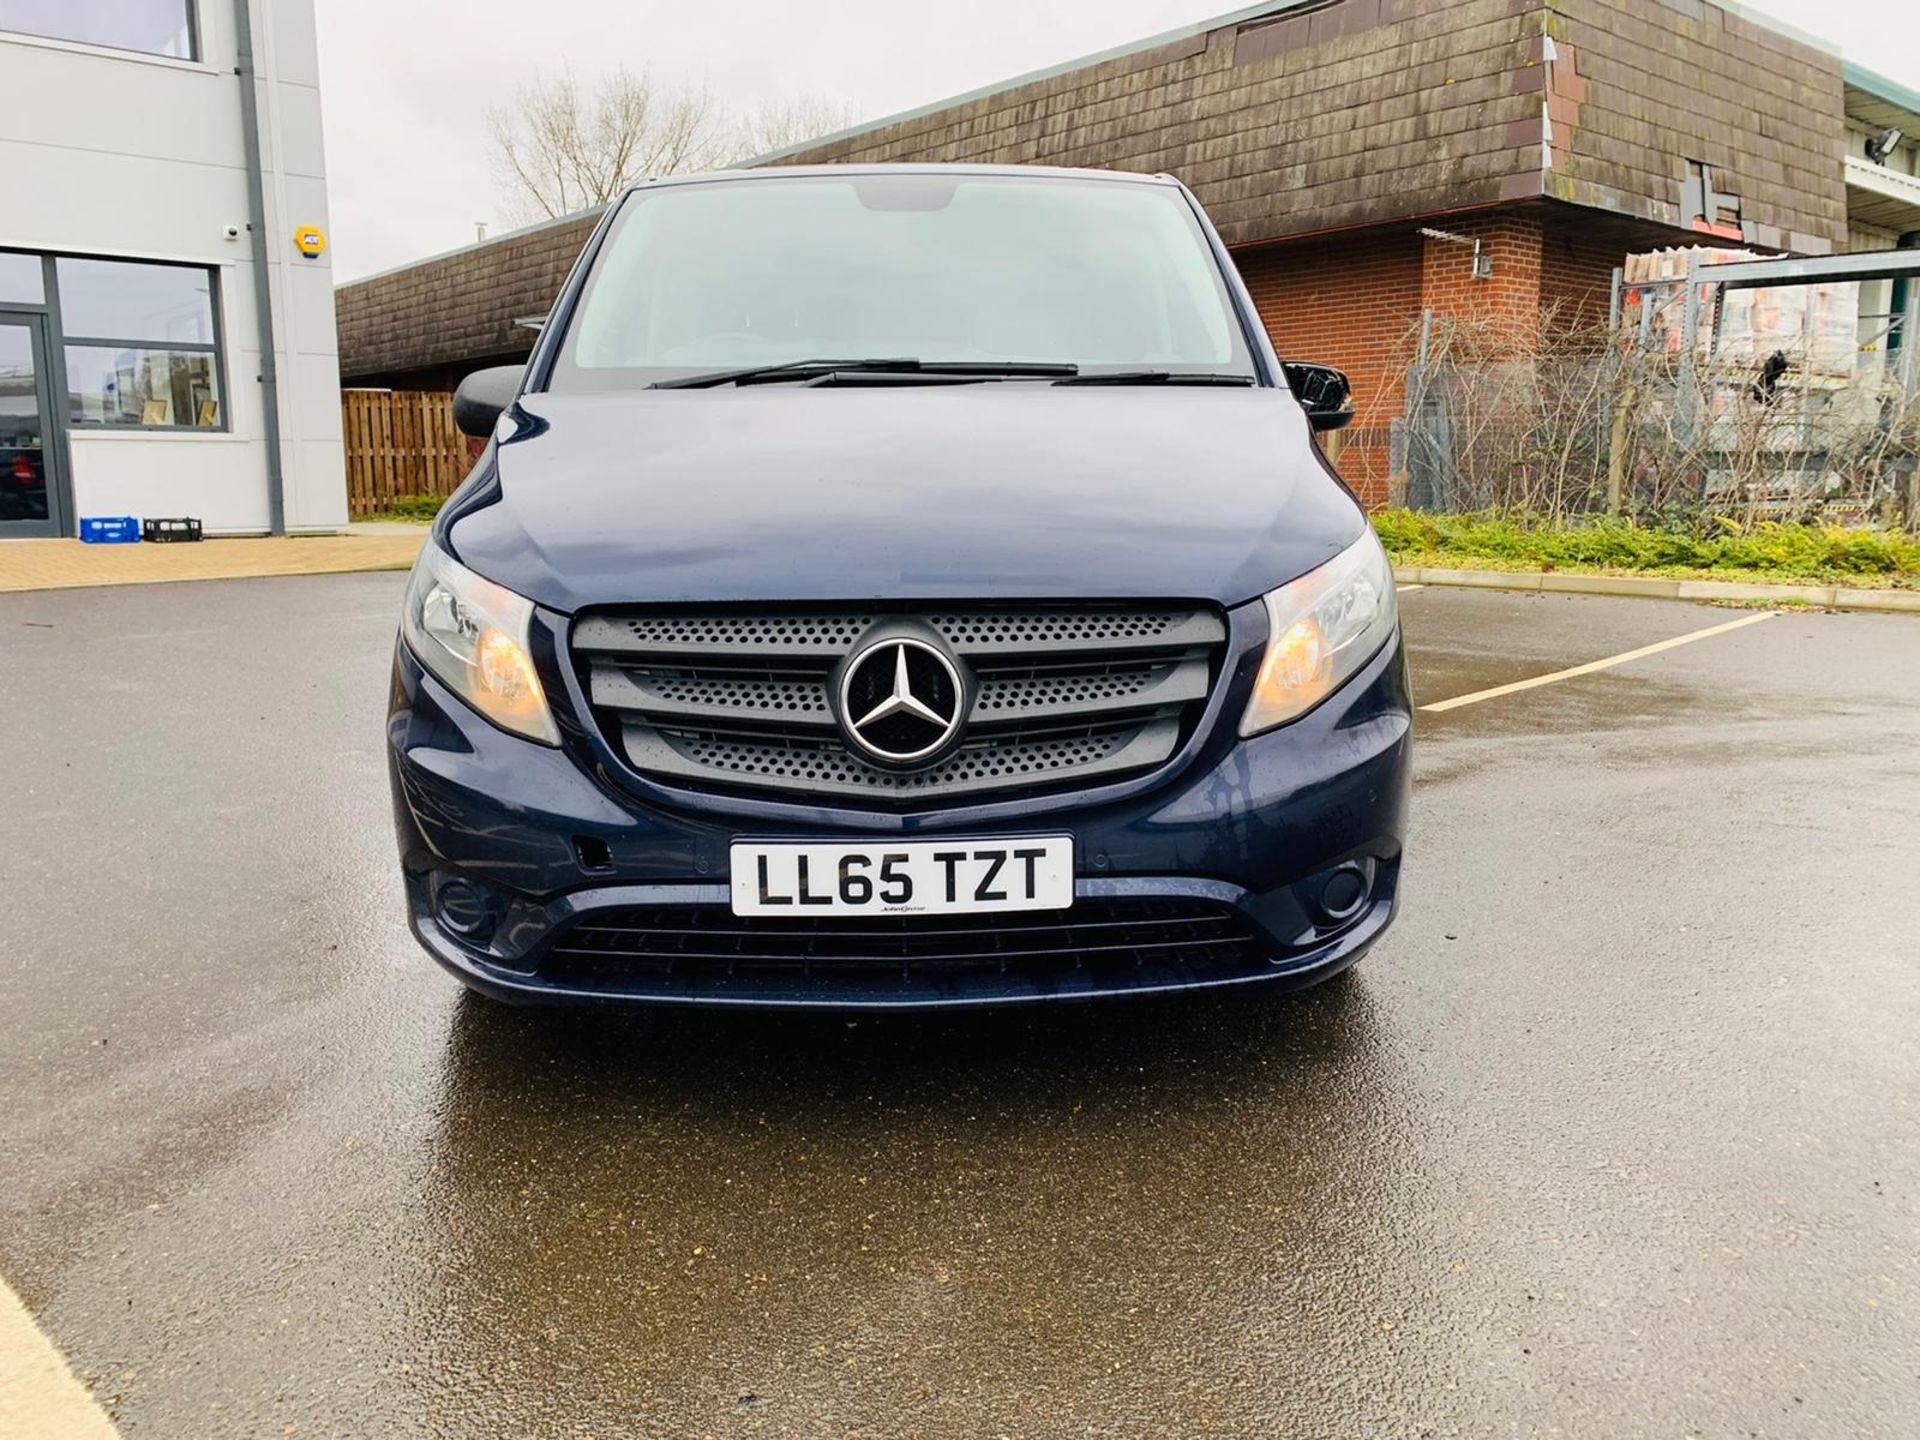 (RESERVE MET) Mercedes Vito 116Cdi Sporty Spec (161 BHP) Bluetech 6 Speed Van - 2016 Model - AC - Image 8 of 28